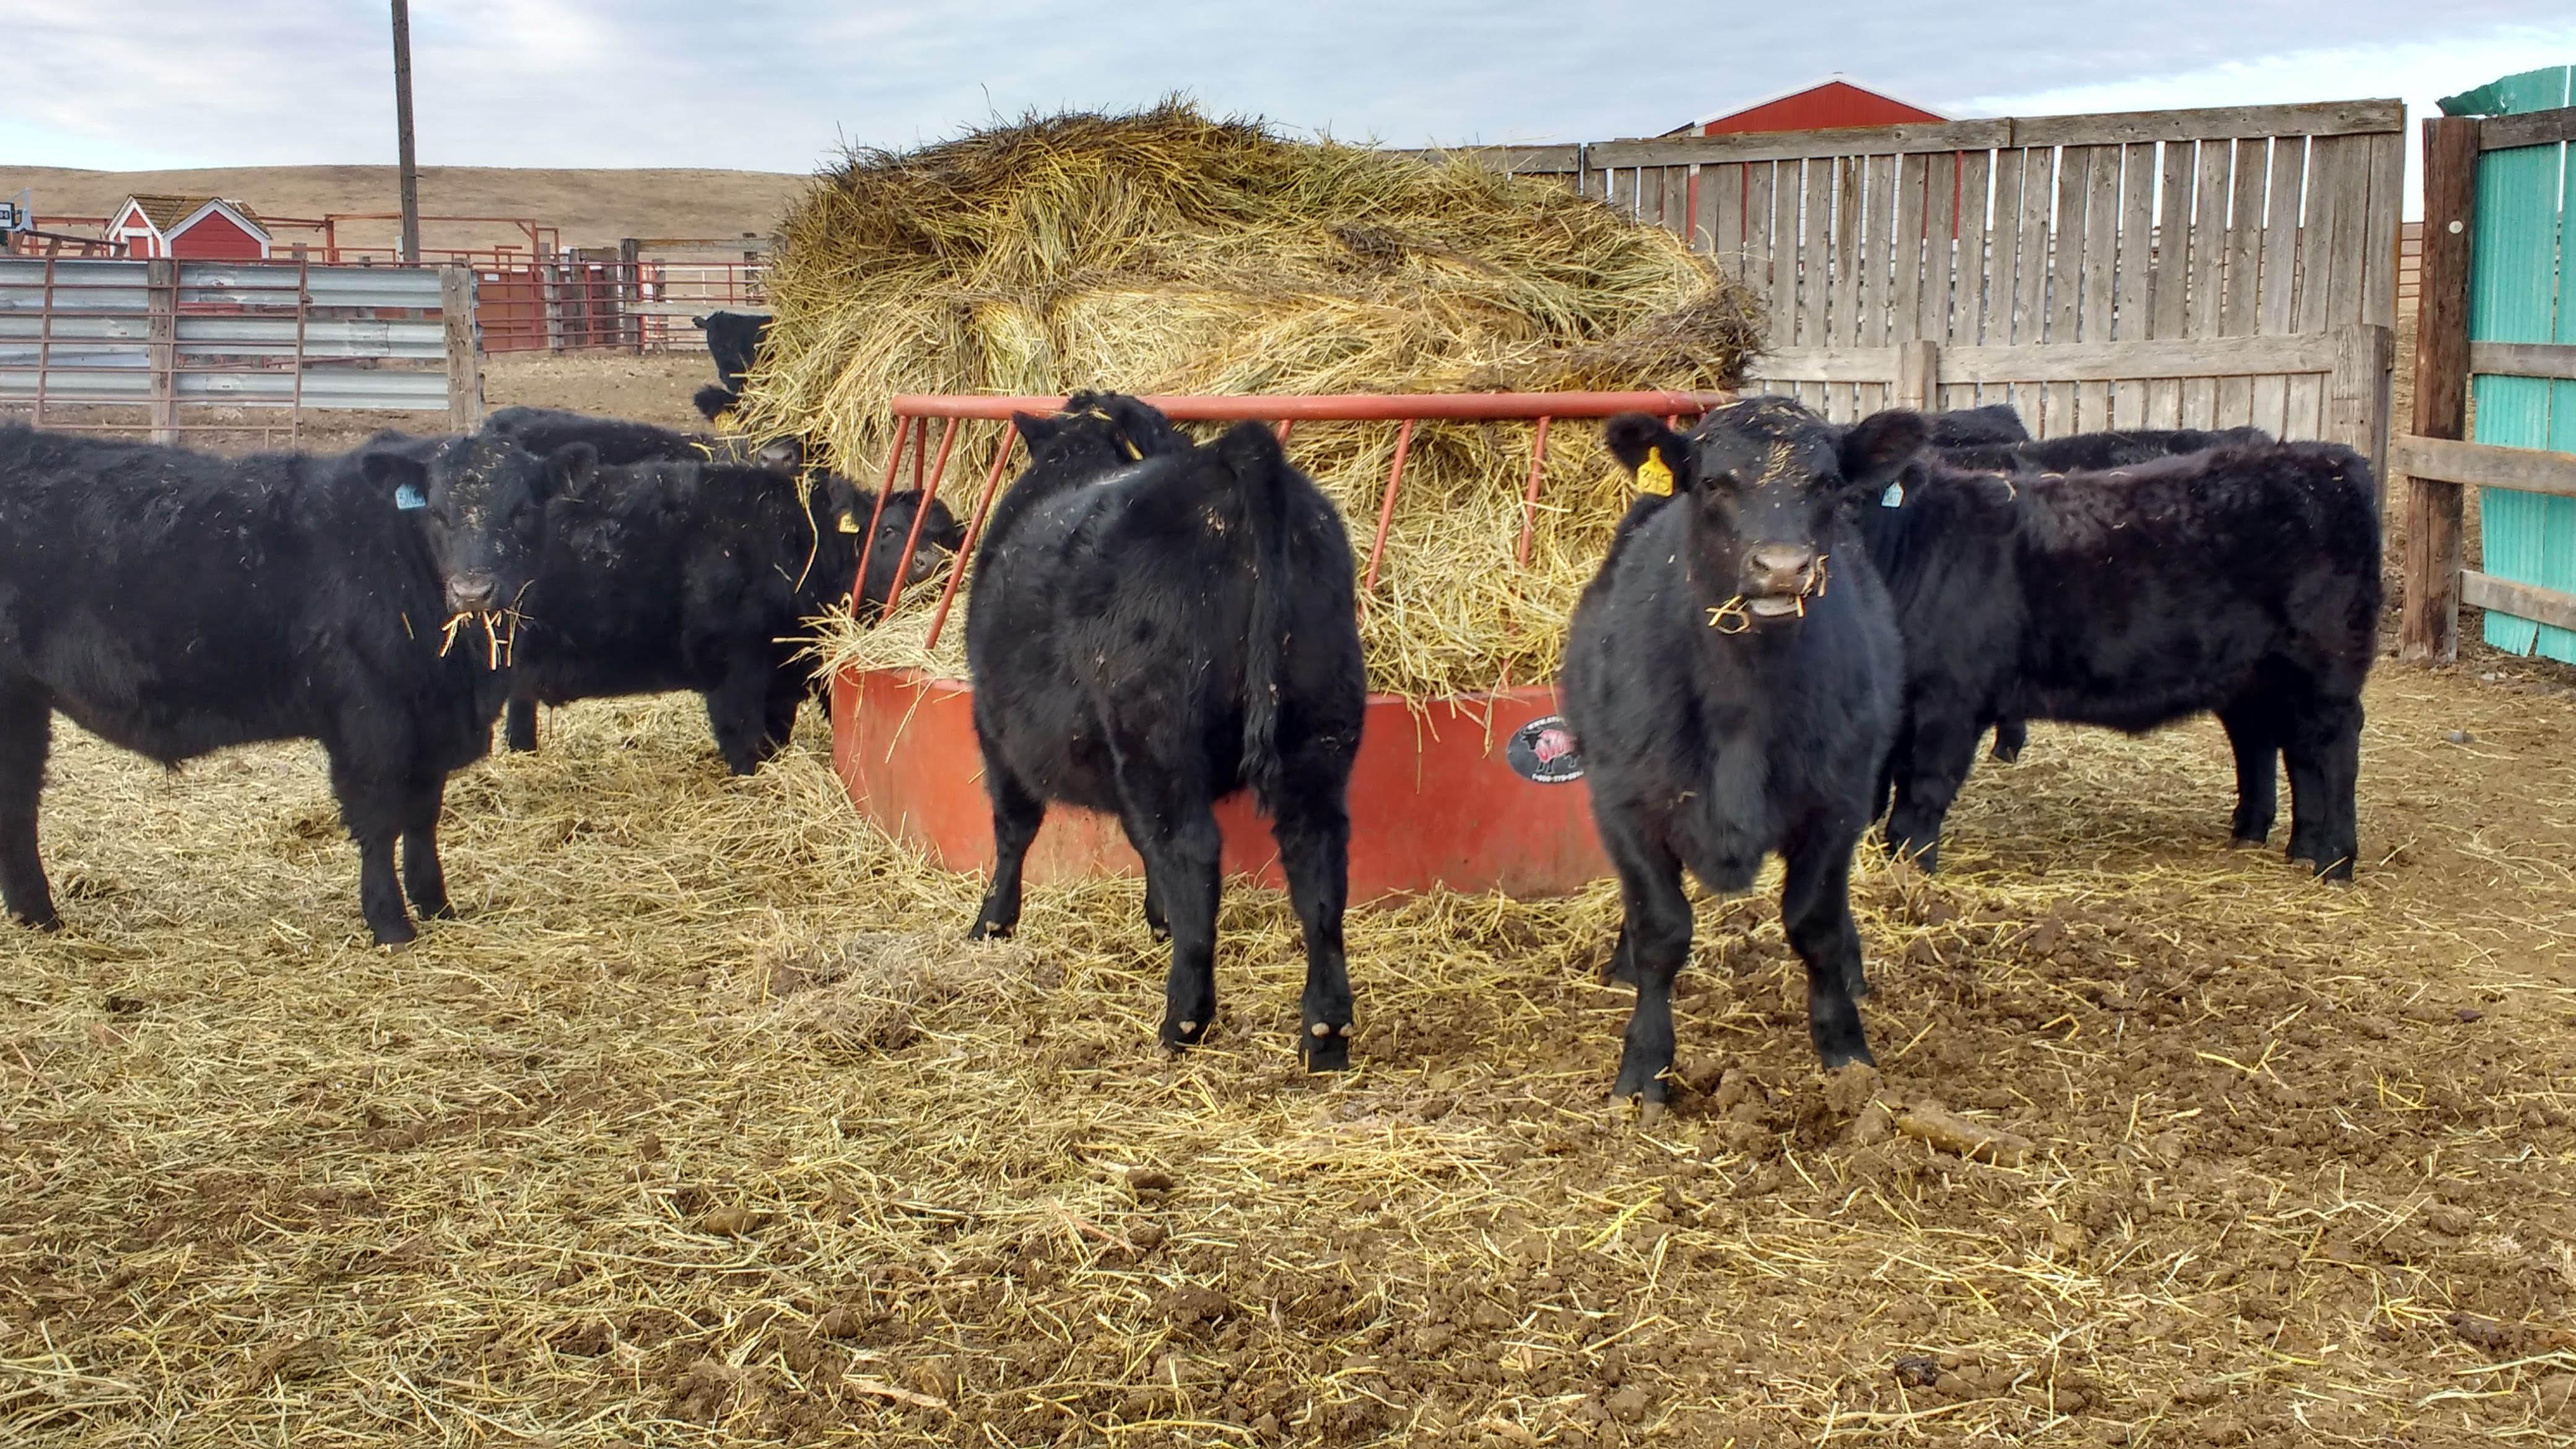 2017 steer calves at weaning